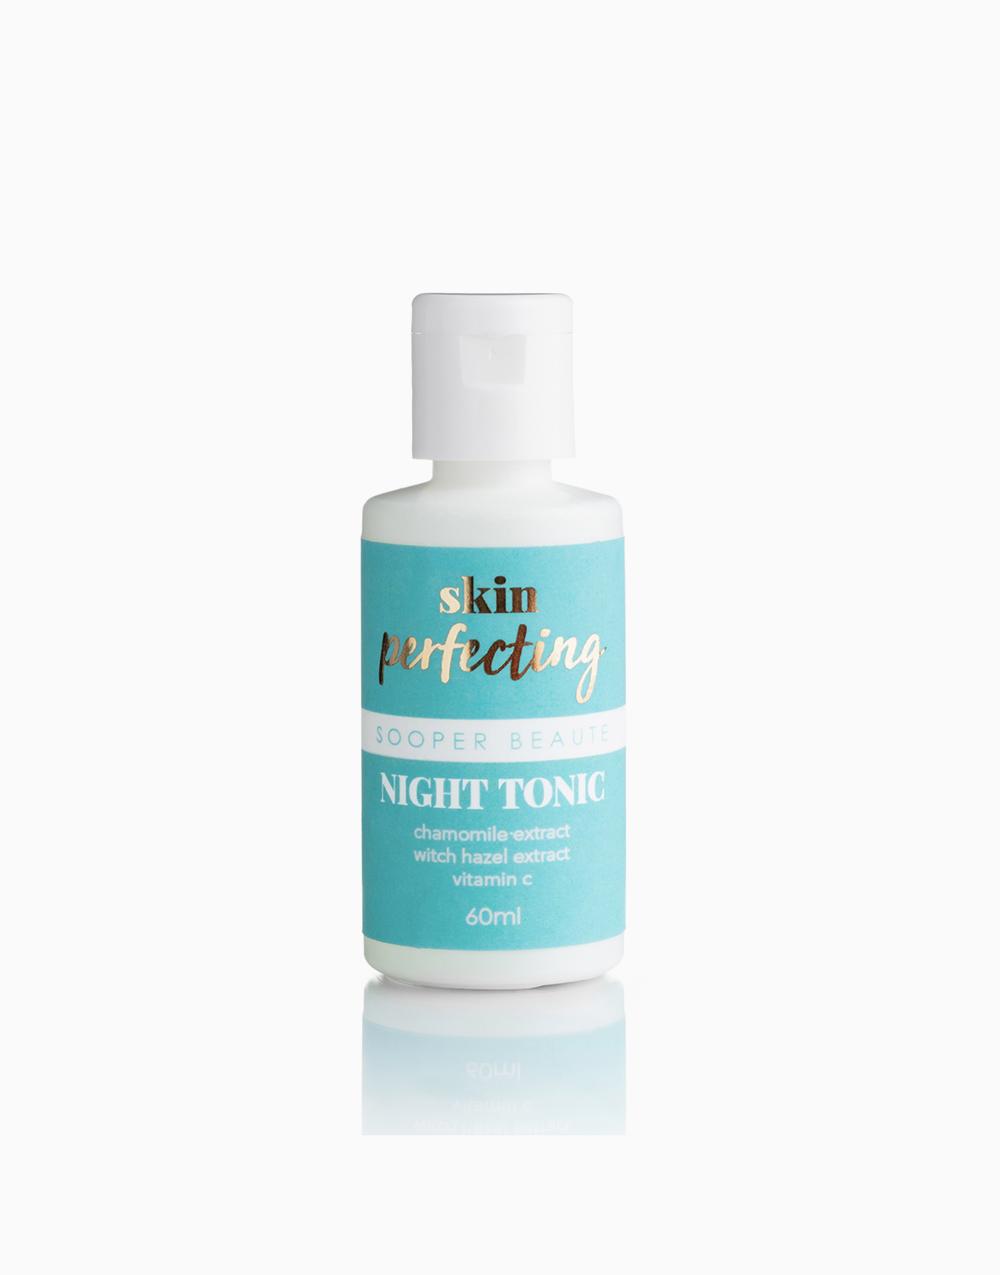 Skin Perfecting Night Tonic by Sooper Beaute